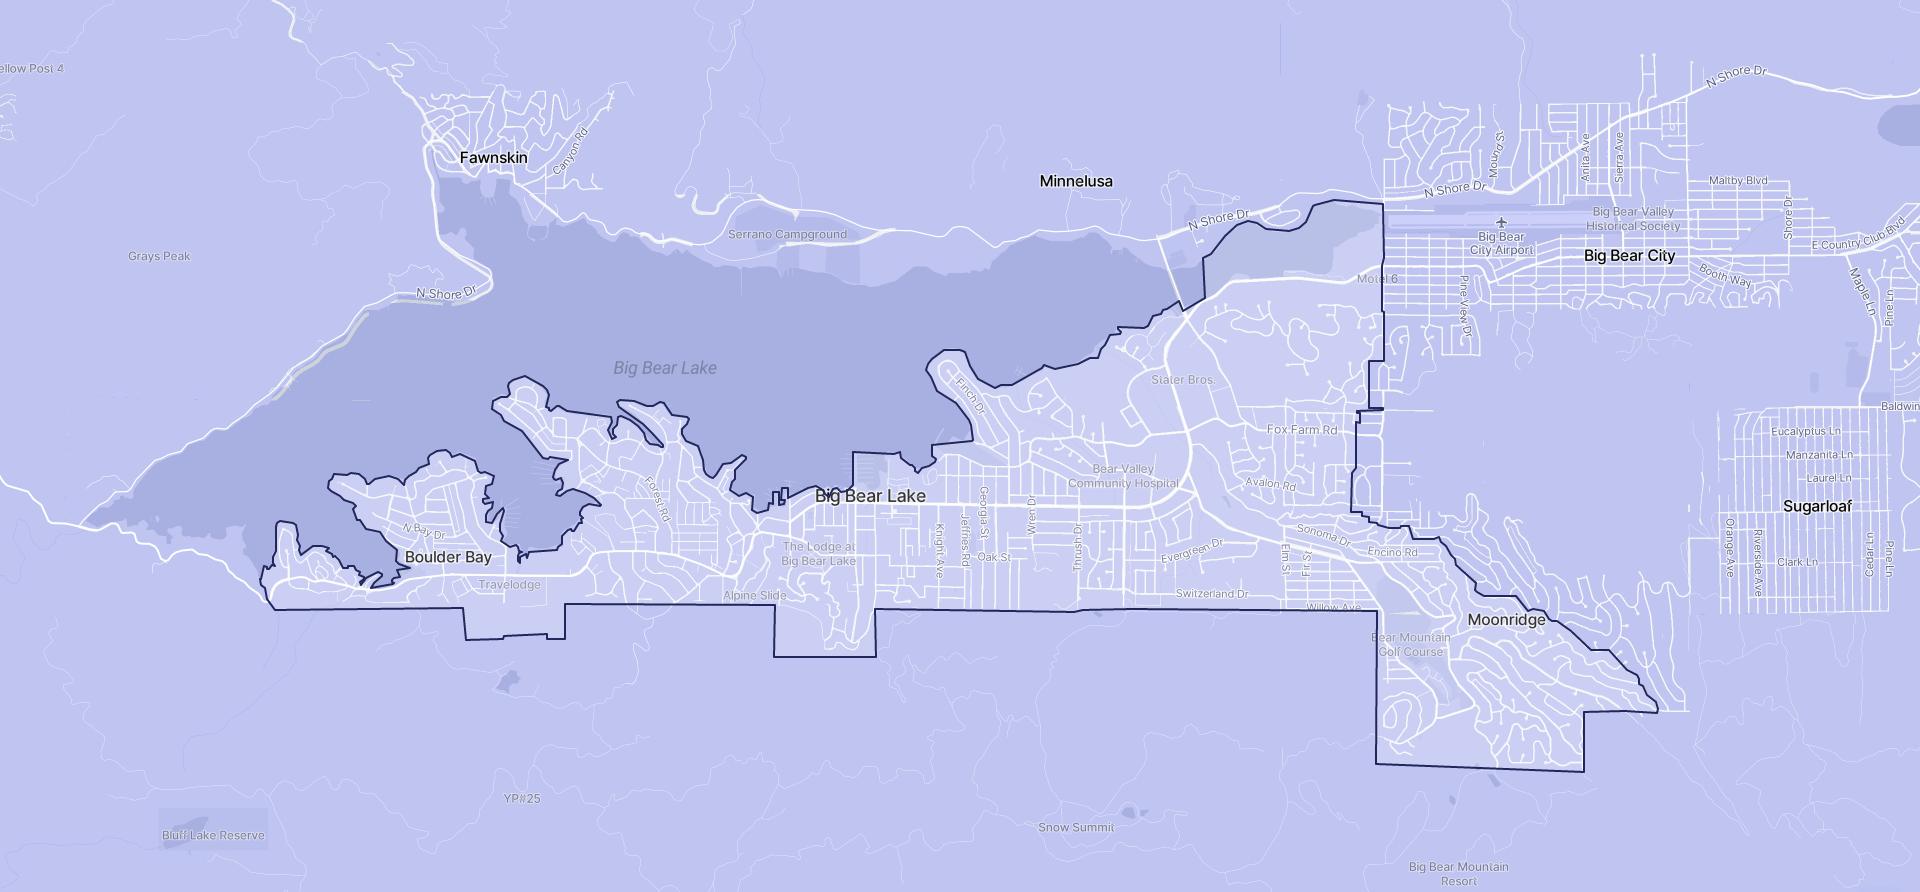 Image of Big Bear Lake boundaries on a map.